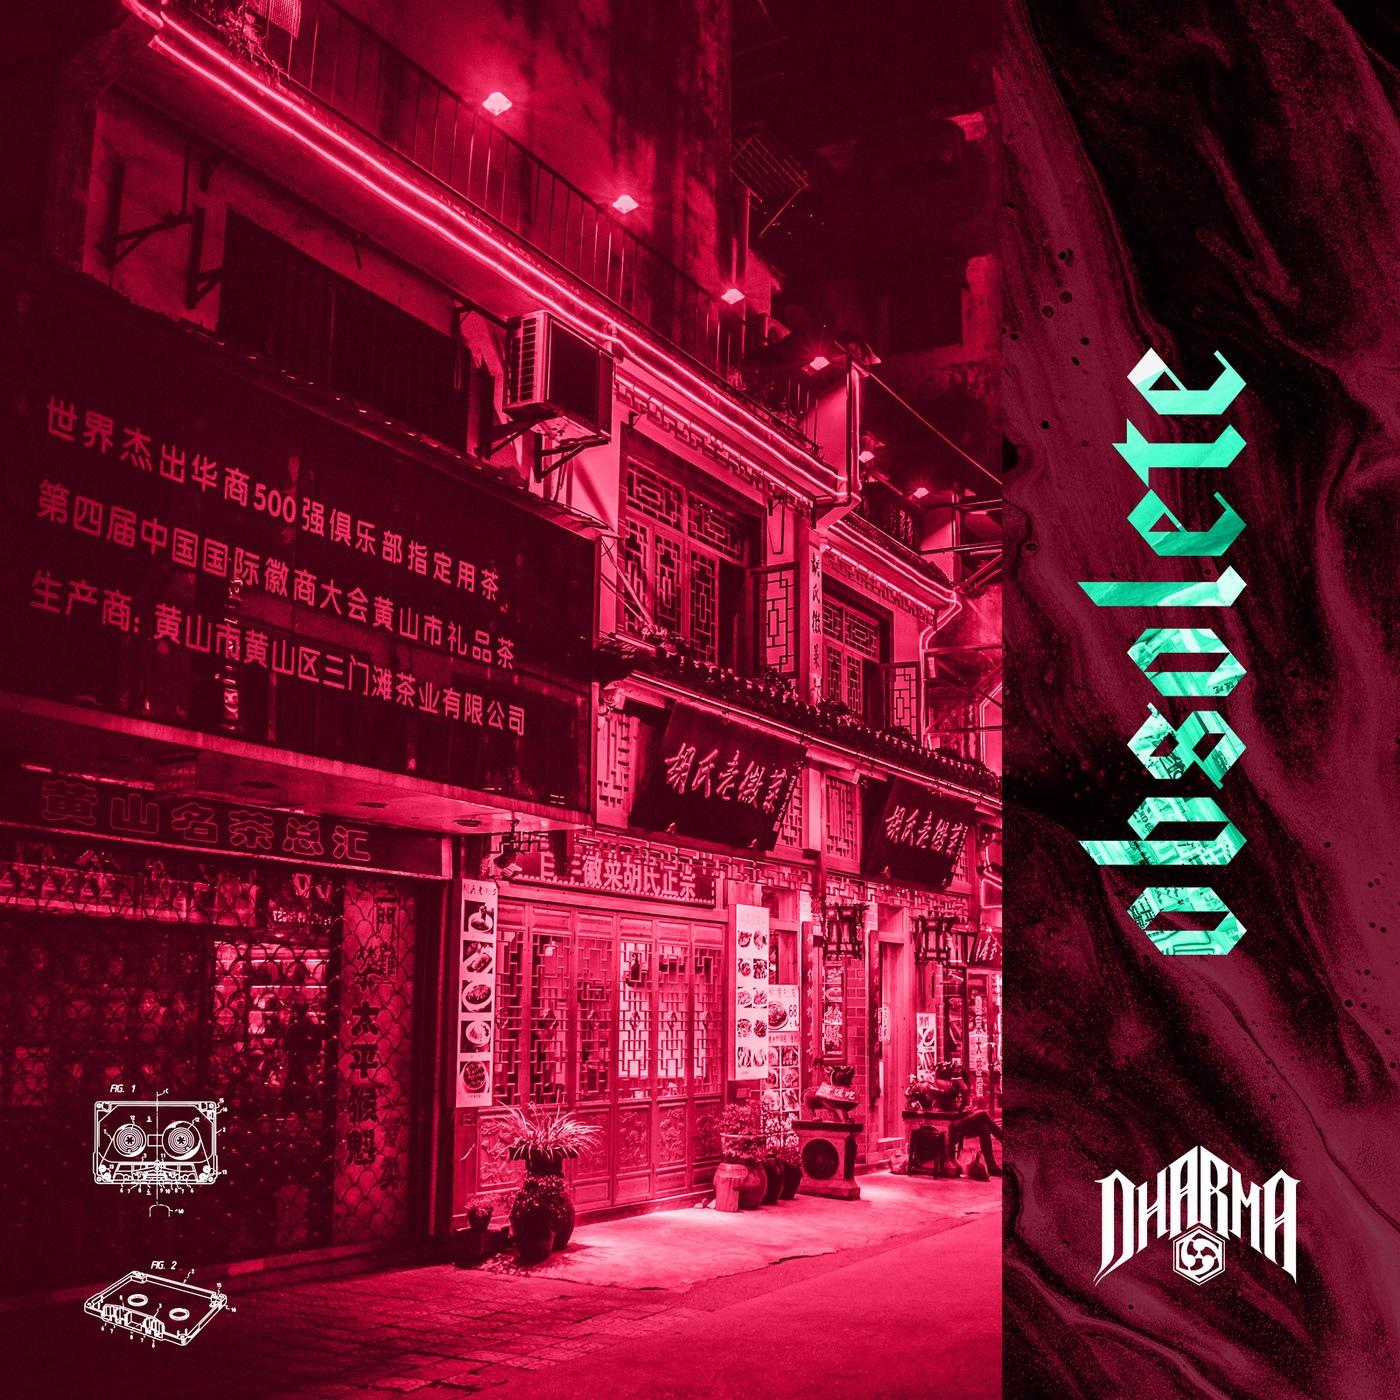 Dharma - Obsolete [EP] (2019)